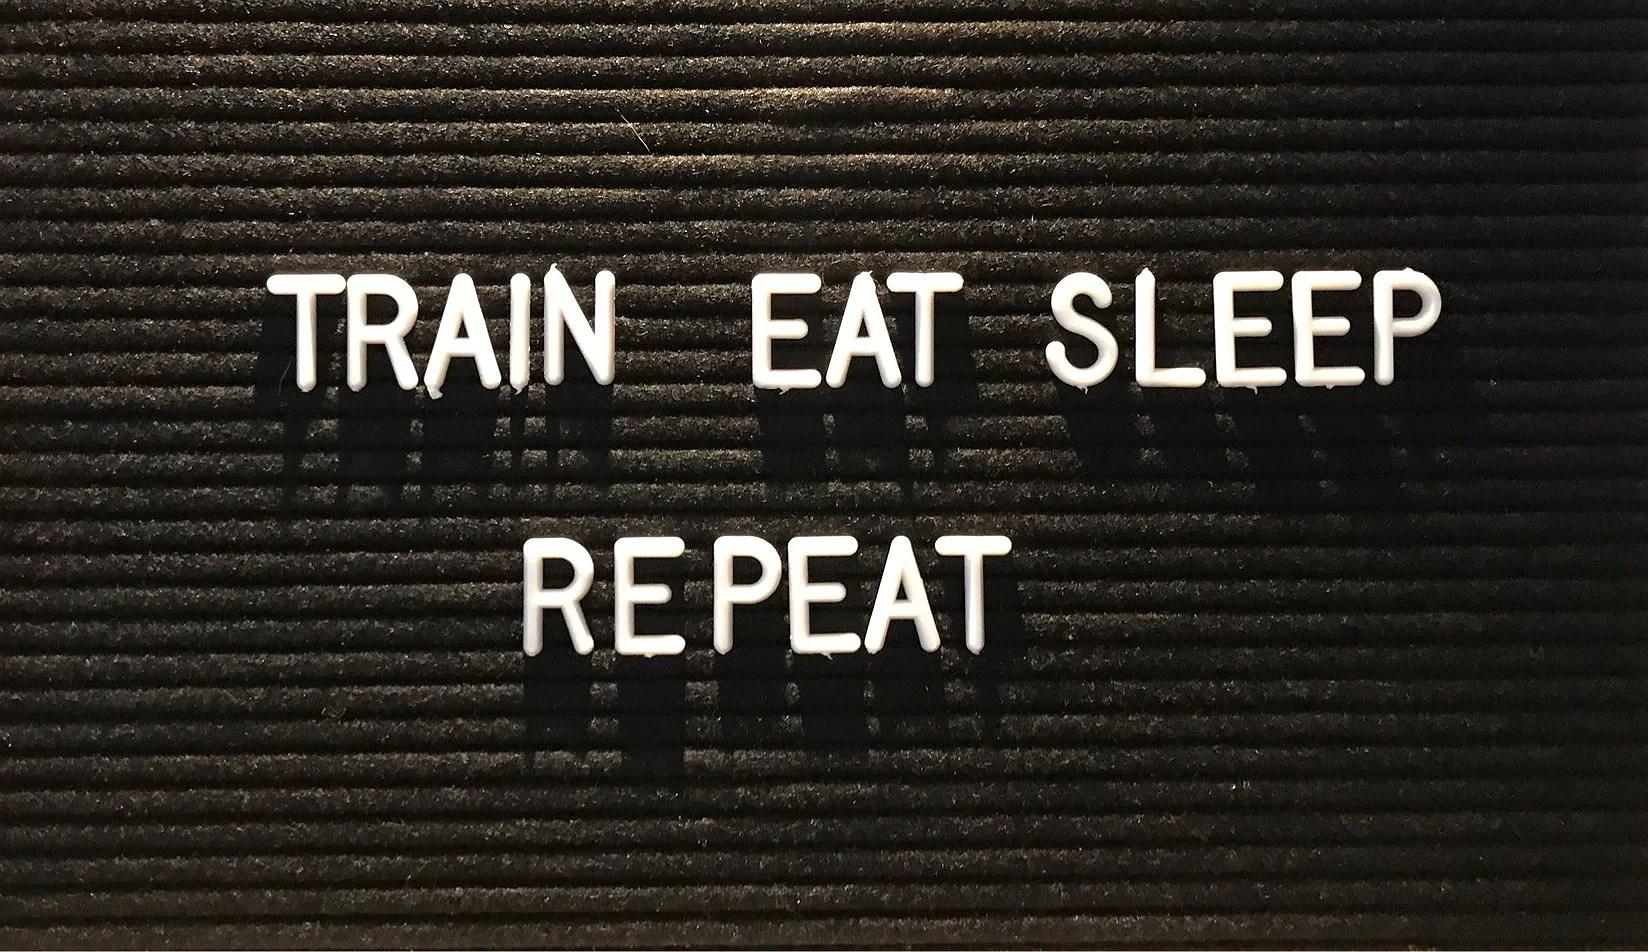 Train, eat, sleep, repeat 💪🏽